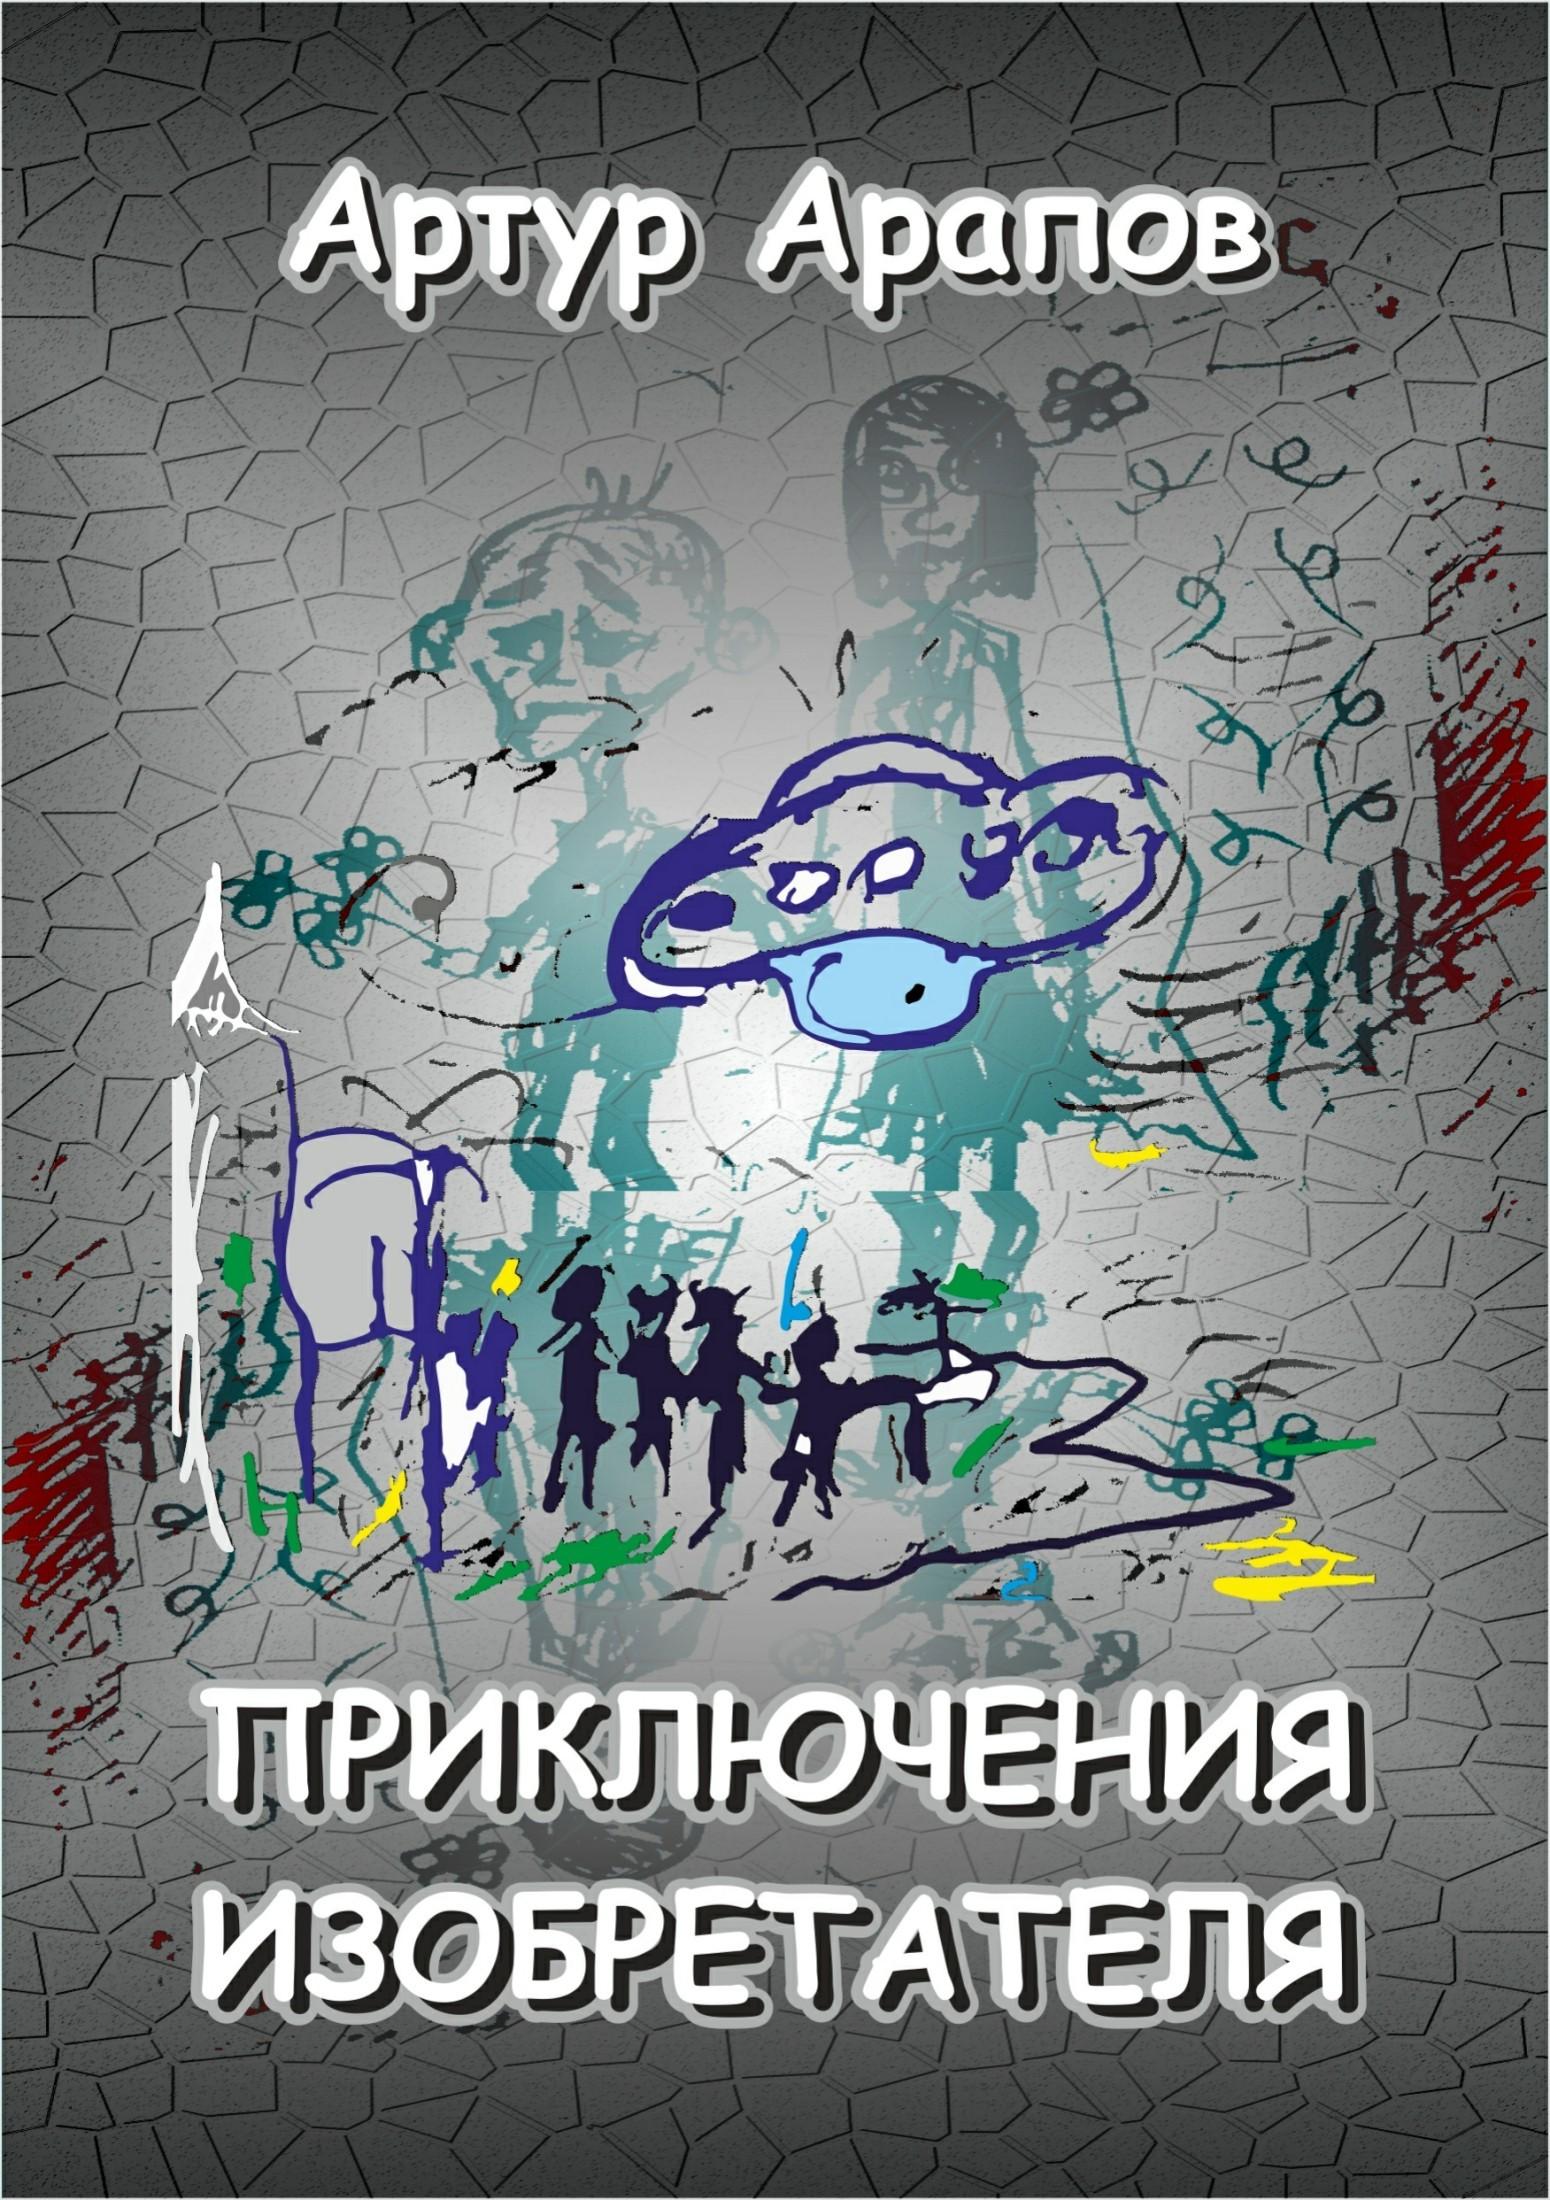 Артур Арапов - Приключения изобретателя